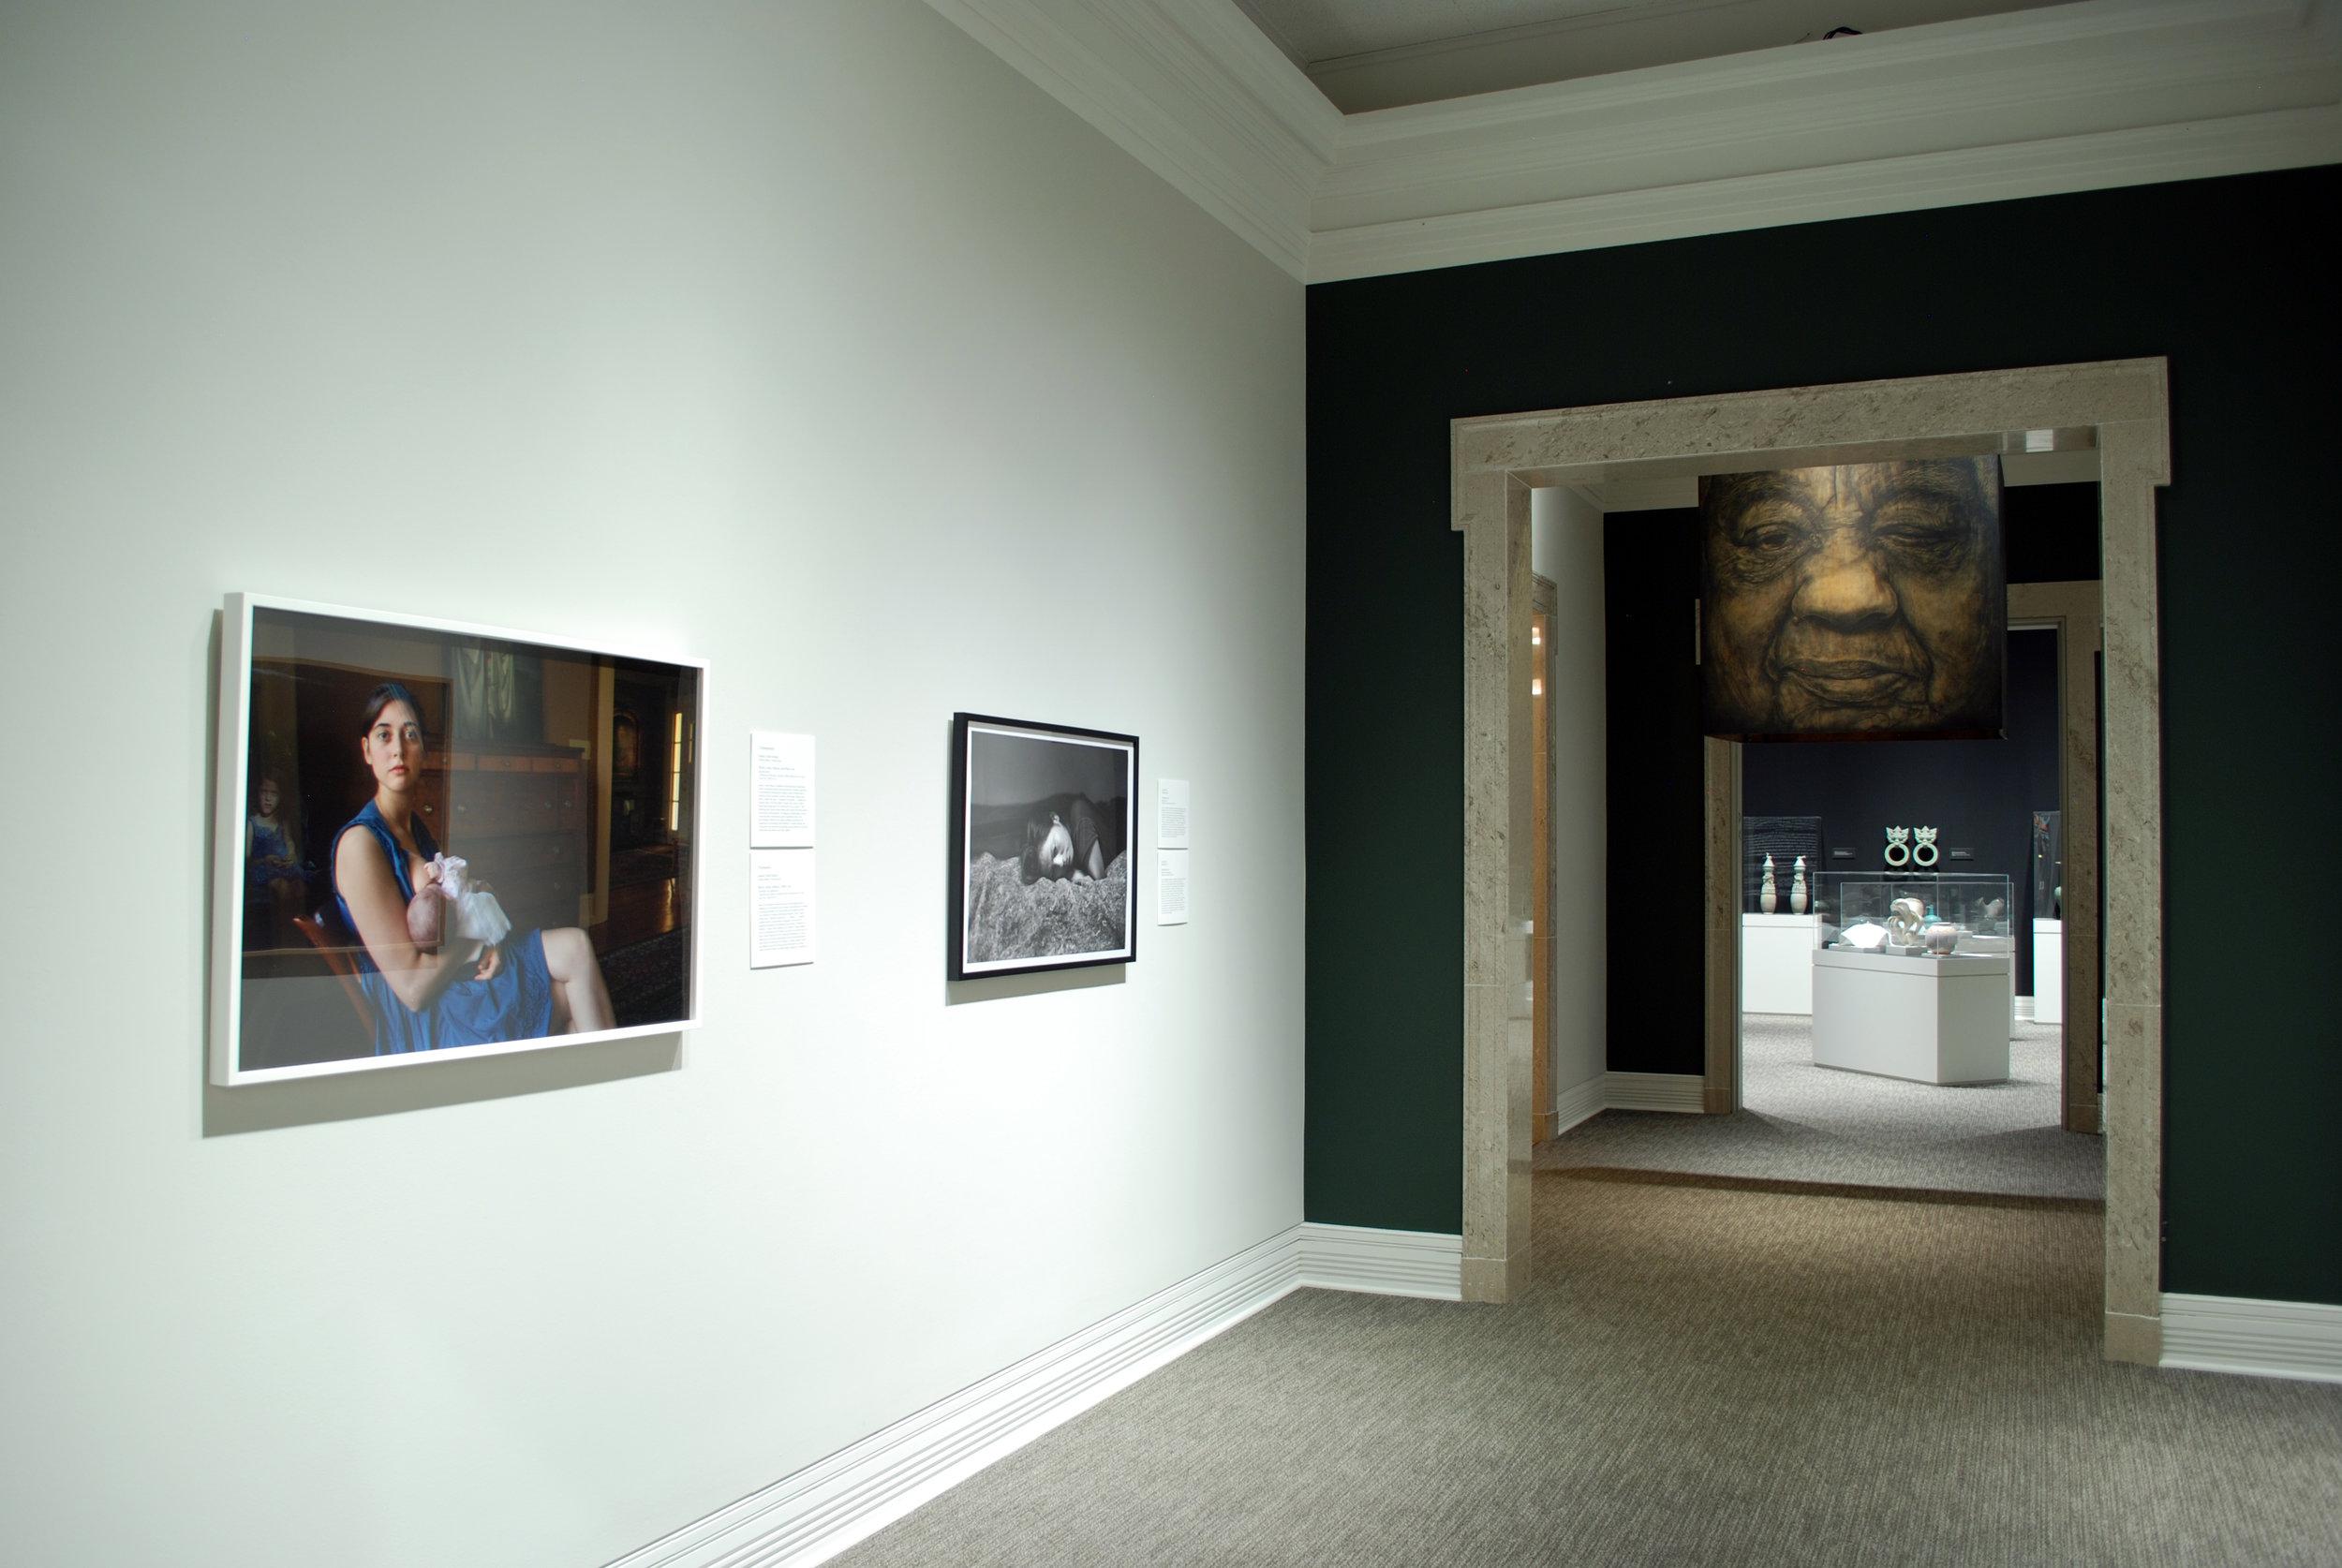 Ackland Art Museum, University of North Carolina Chapel Hill, North Carolina 2017